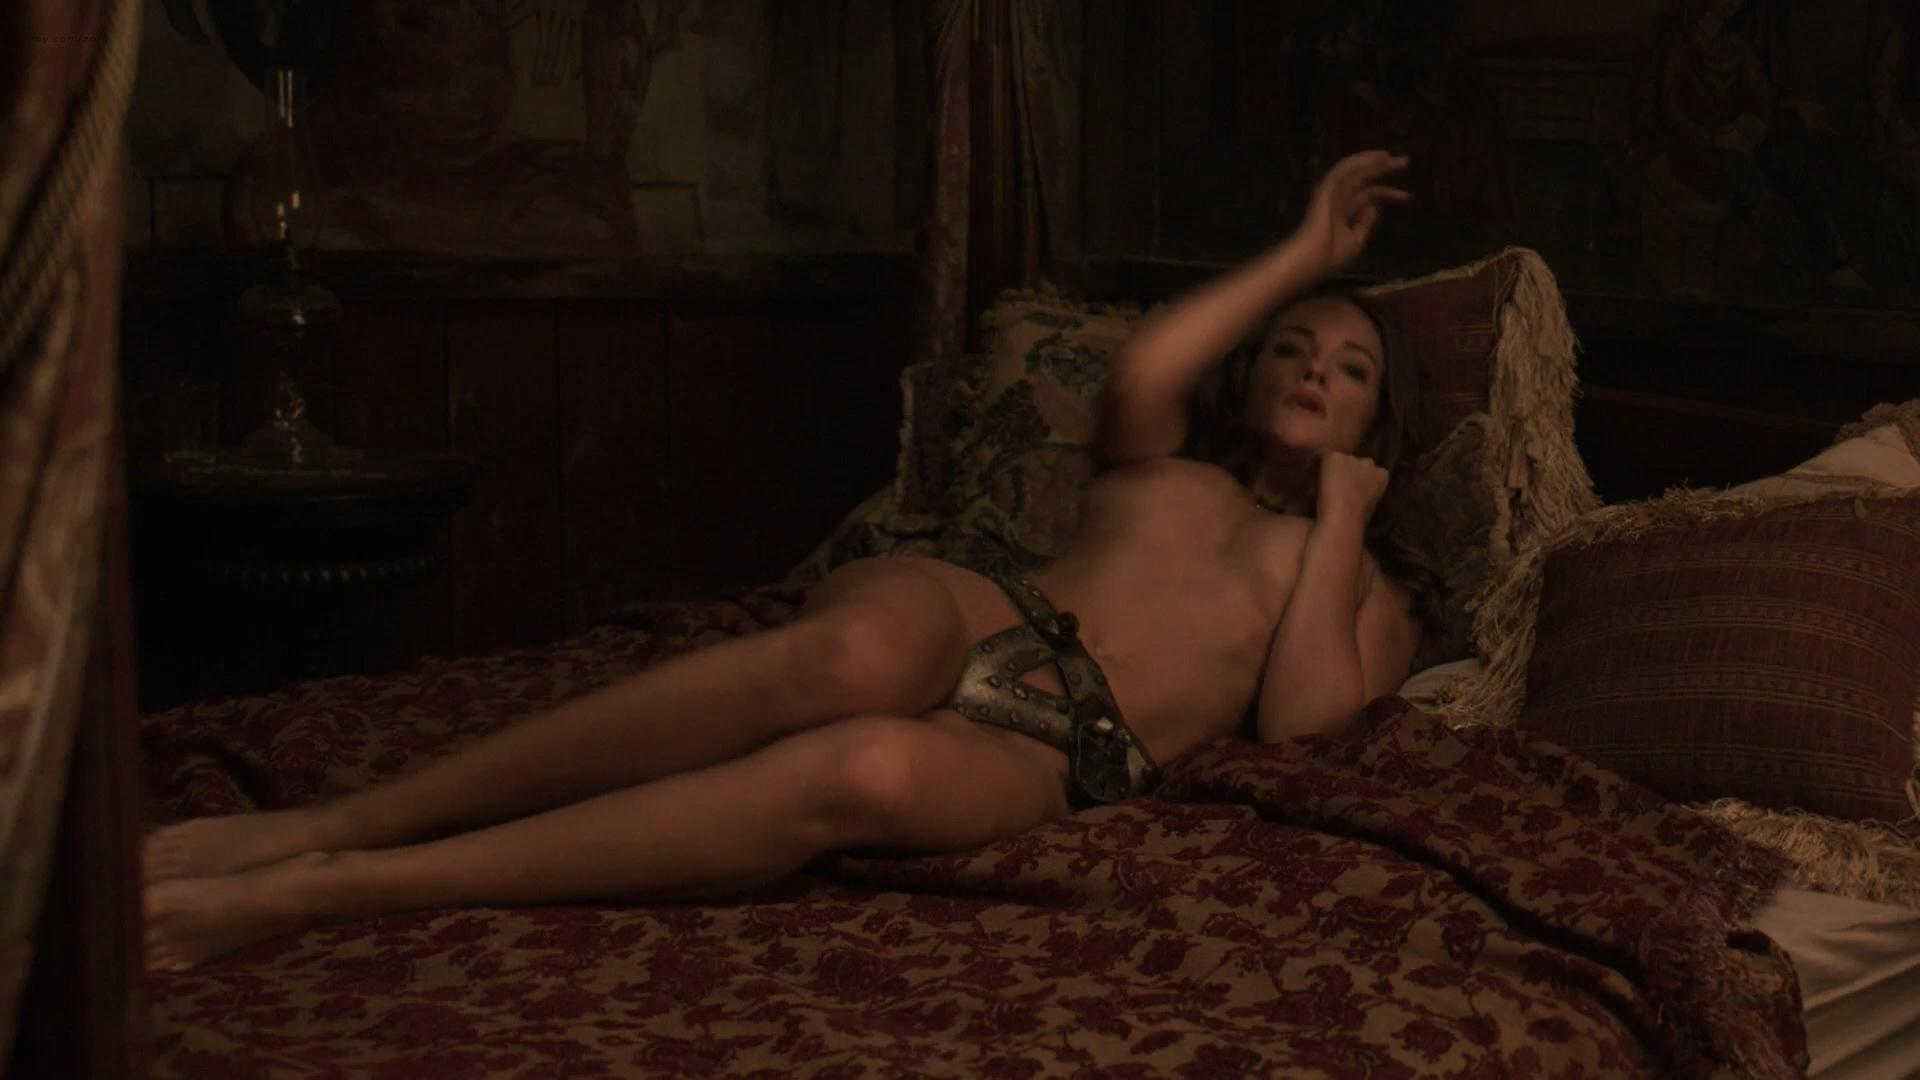 nude-fargo-woman